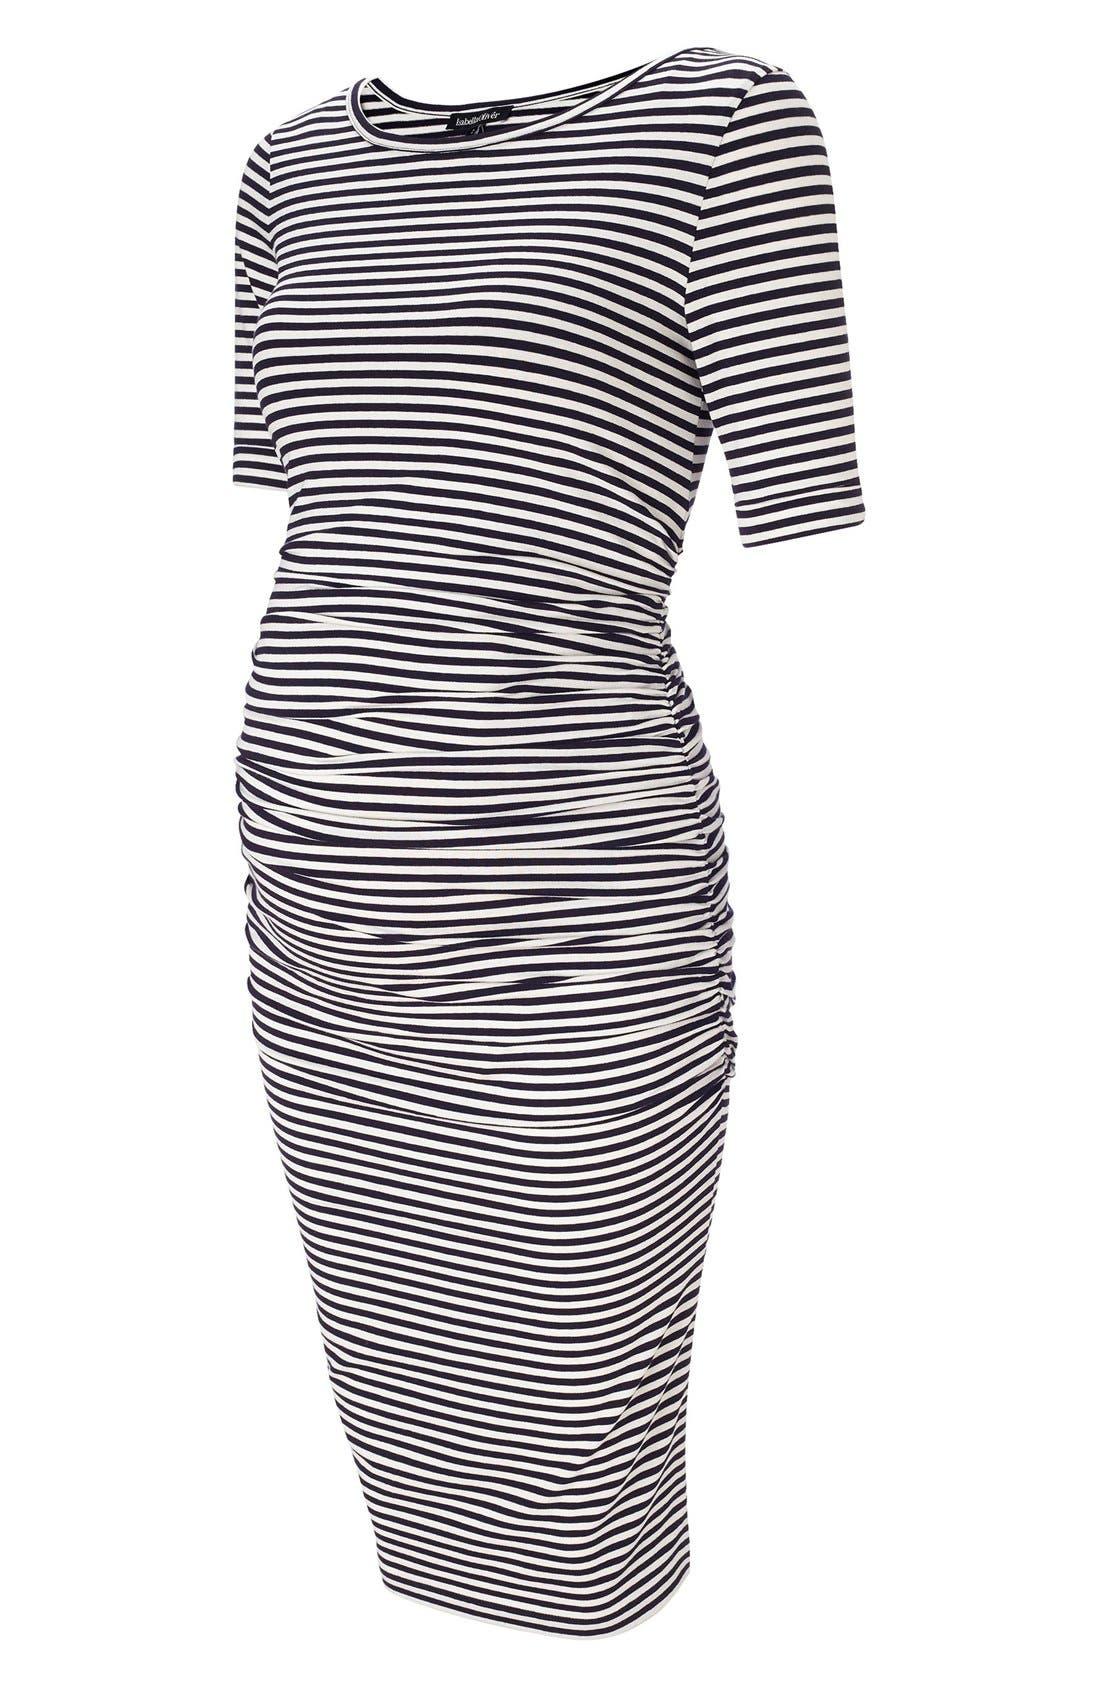 Arlington Stripe Maternity Dress,                             Main thumbnail 1, color,                             410